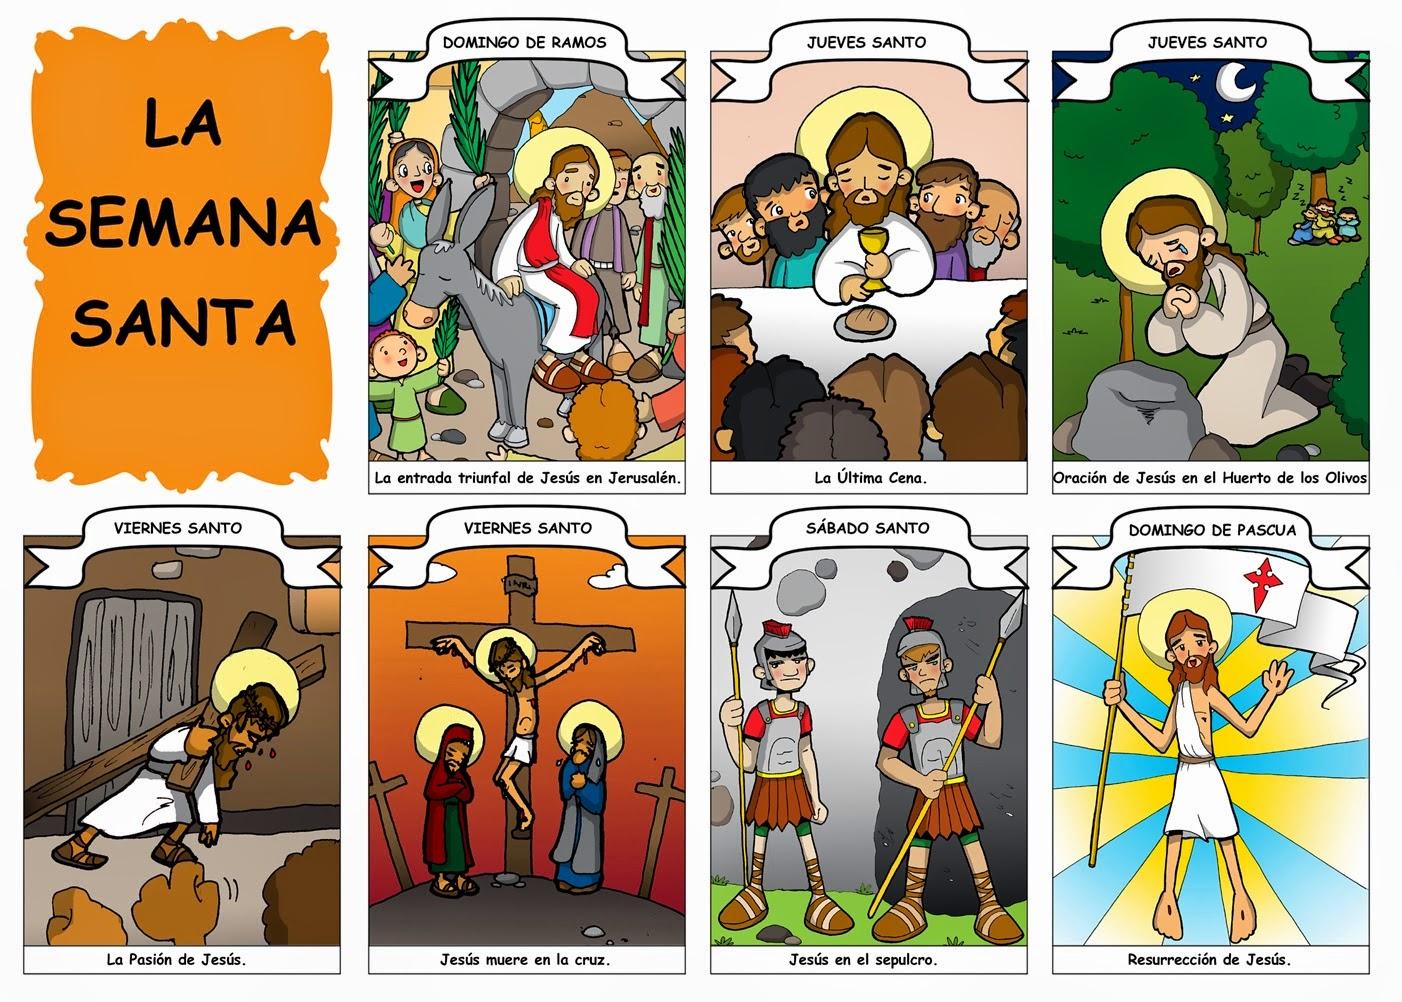 Blog Católico Gotitas Espirituales ®: LA SEMANA SANTA EN IMÁGENES ...